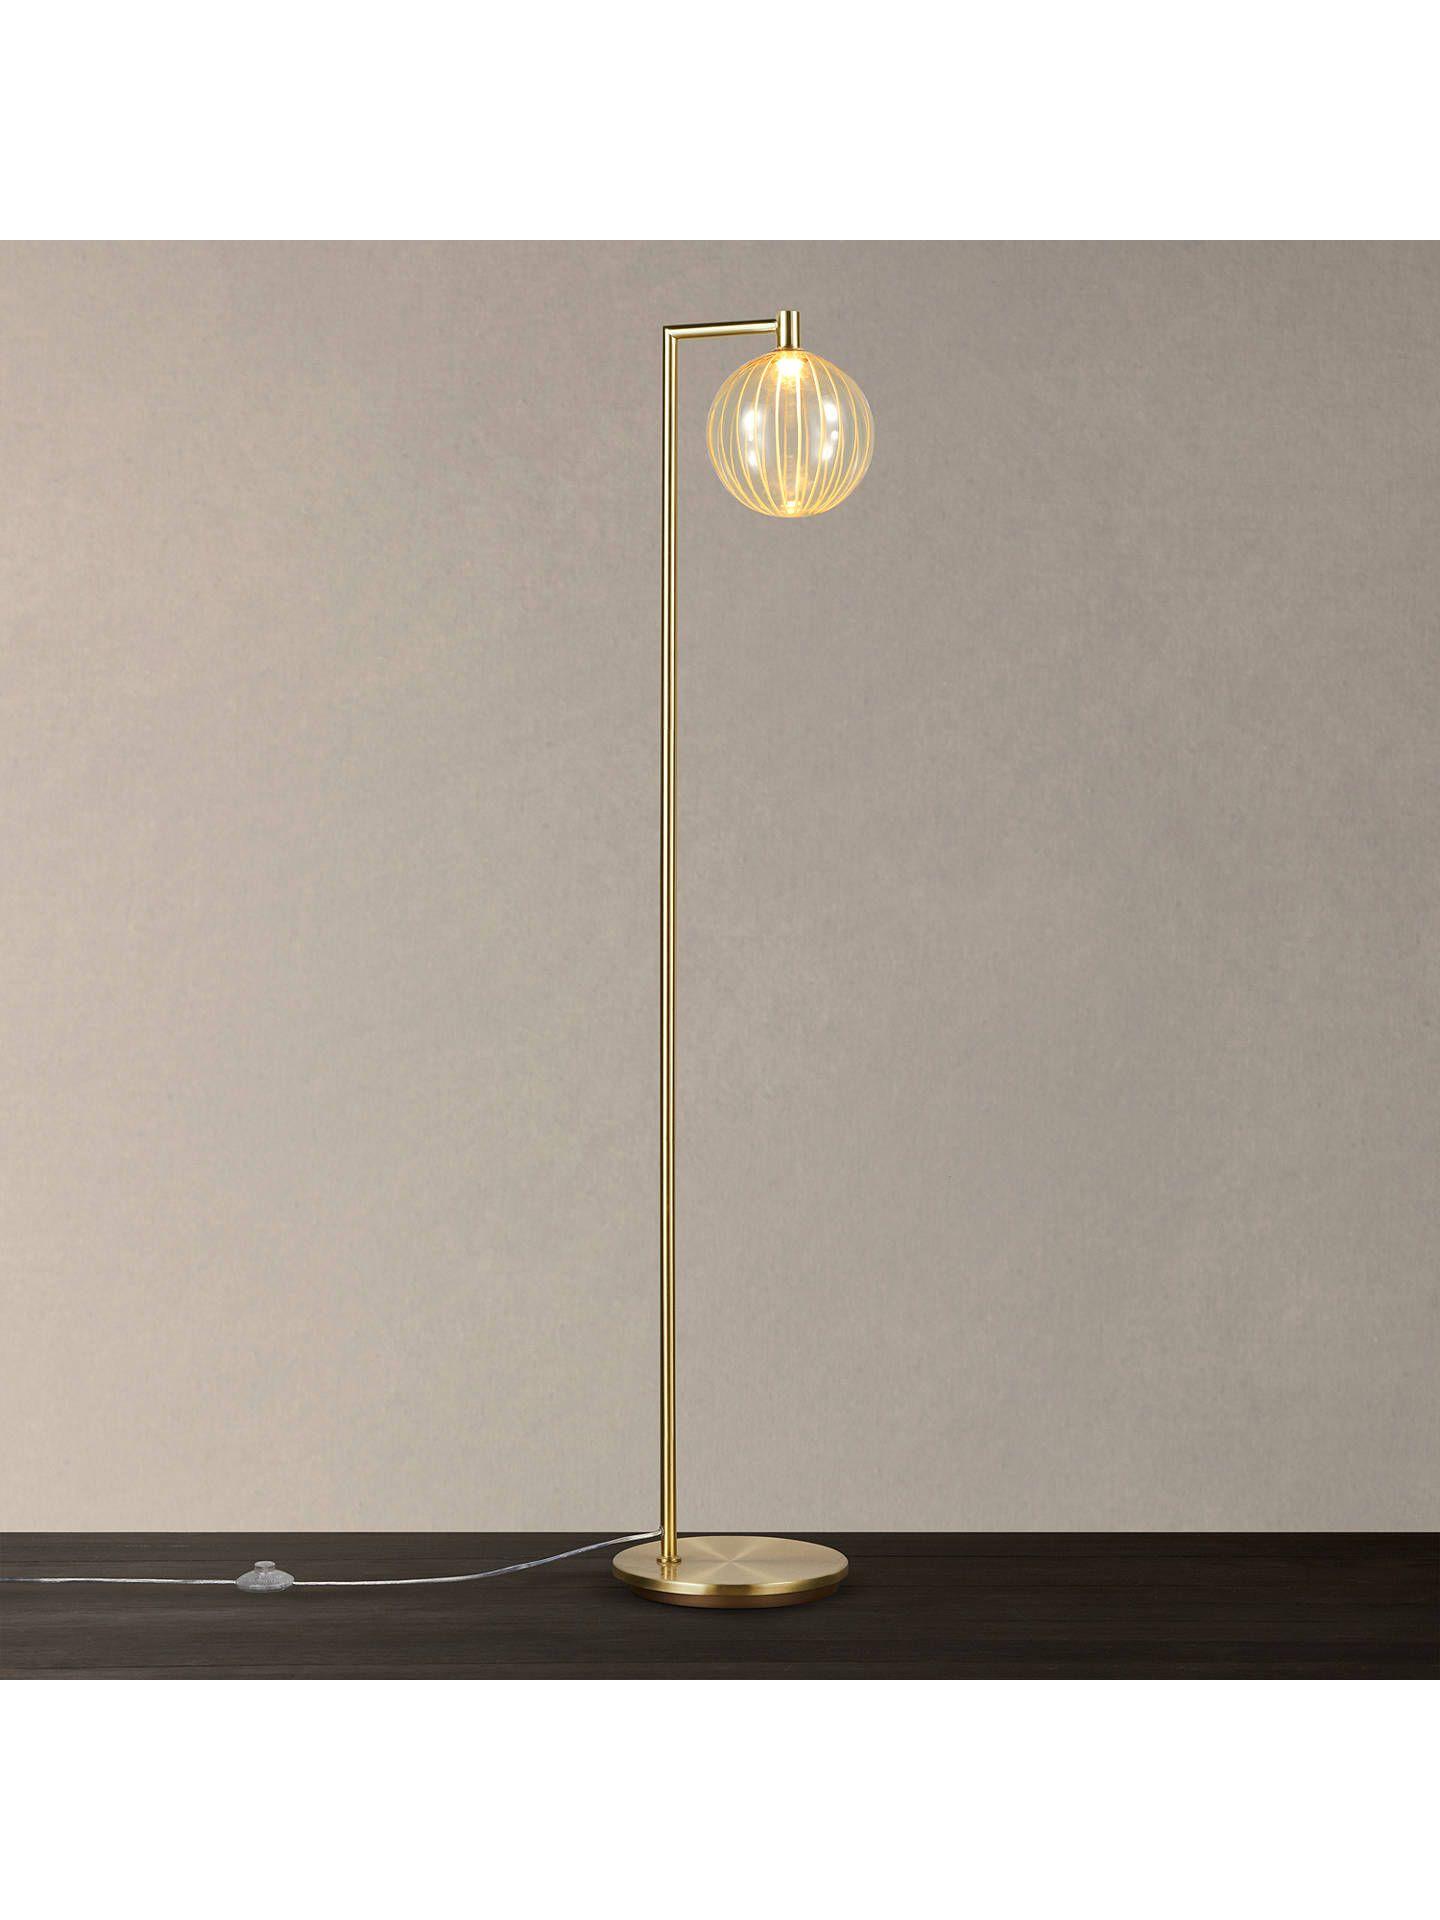 John Lewis & Partners Marlo LED Floor Lamp, Gold Led